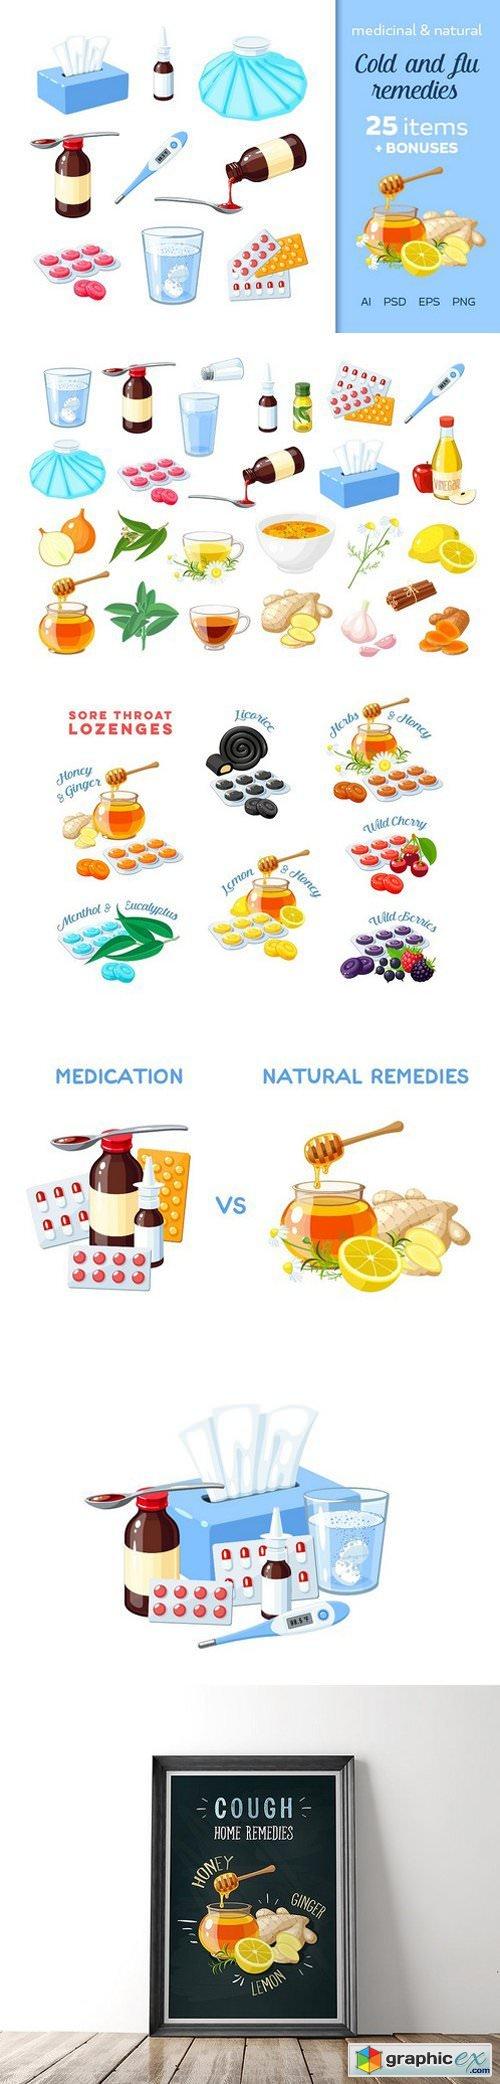 Medicinal and natural flu remedies